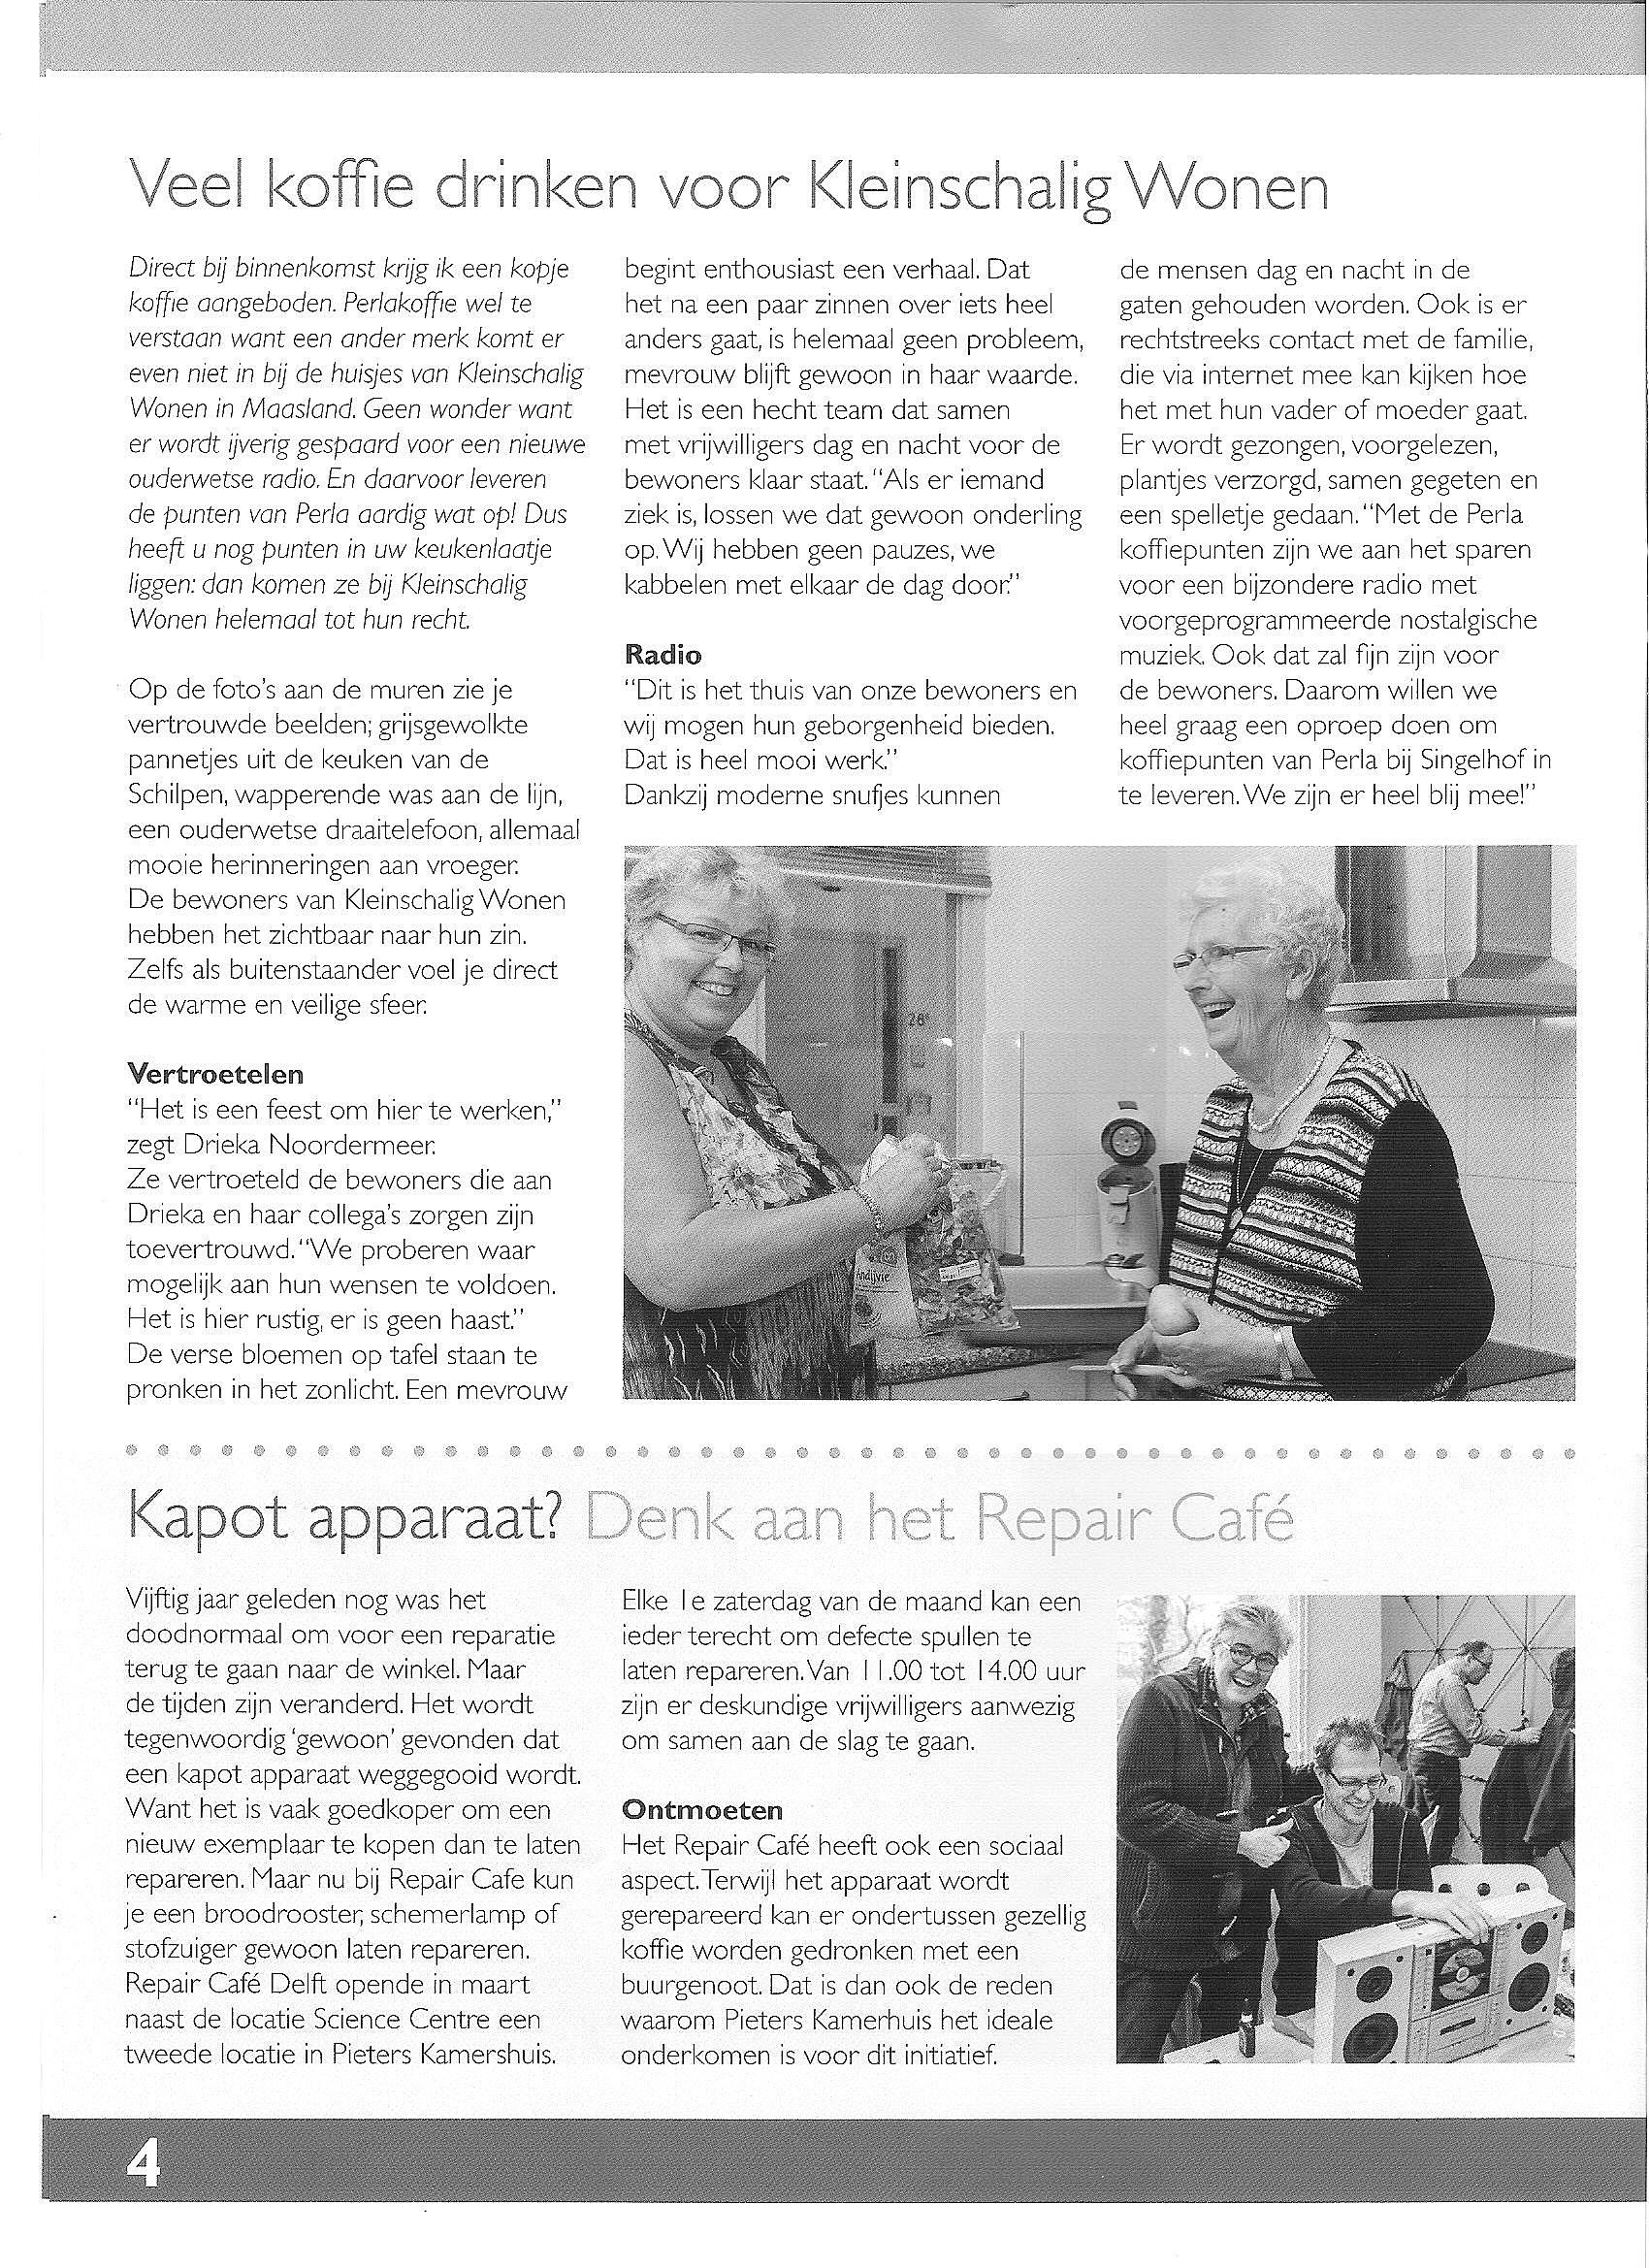 Repair Cafe P.v. Foreest